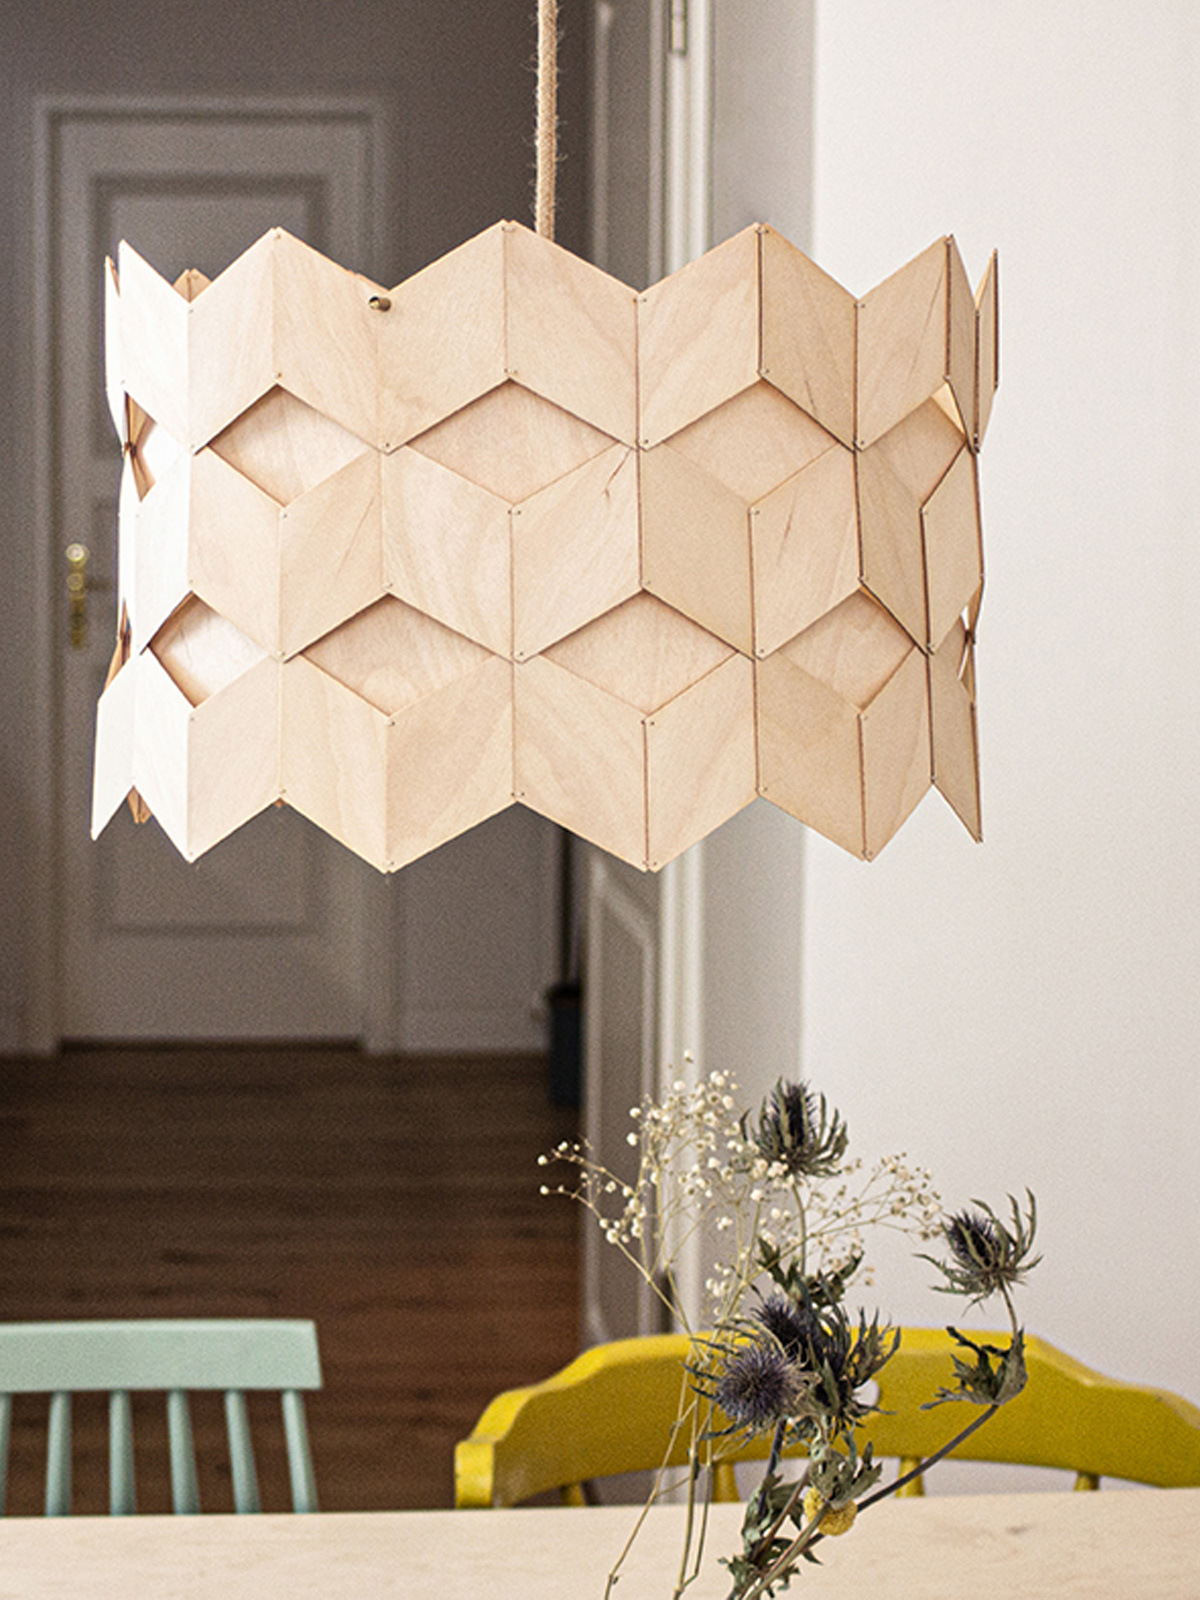 MAERU Rutuu Holz Lampe DesignOrt Onlineshop Lampen Berlin